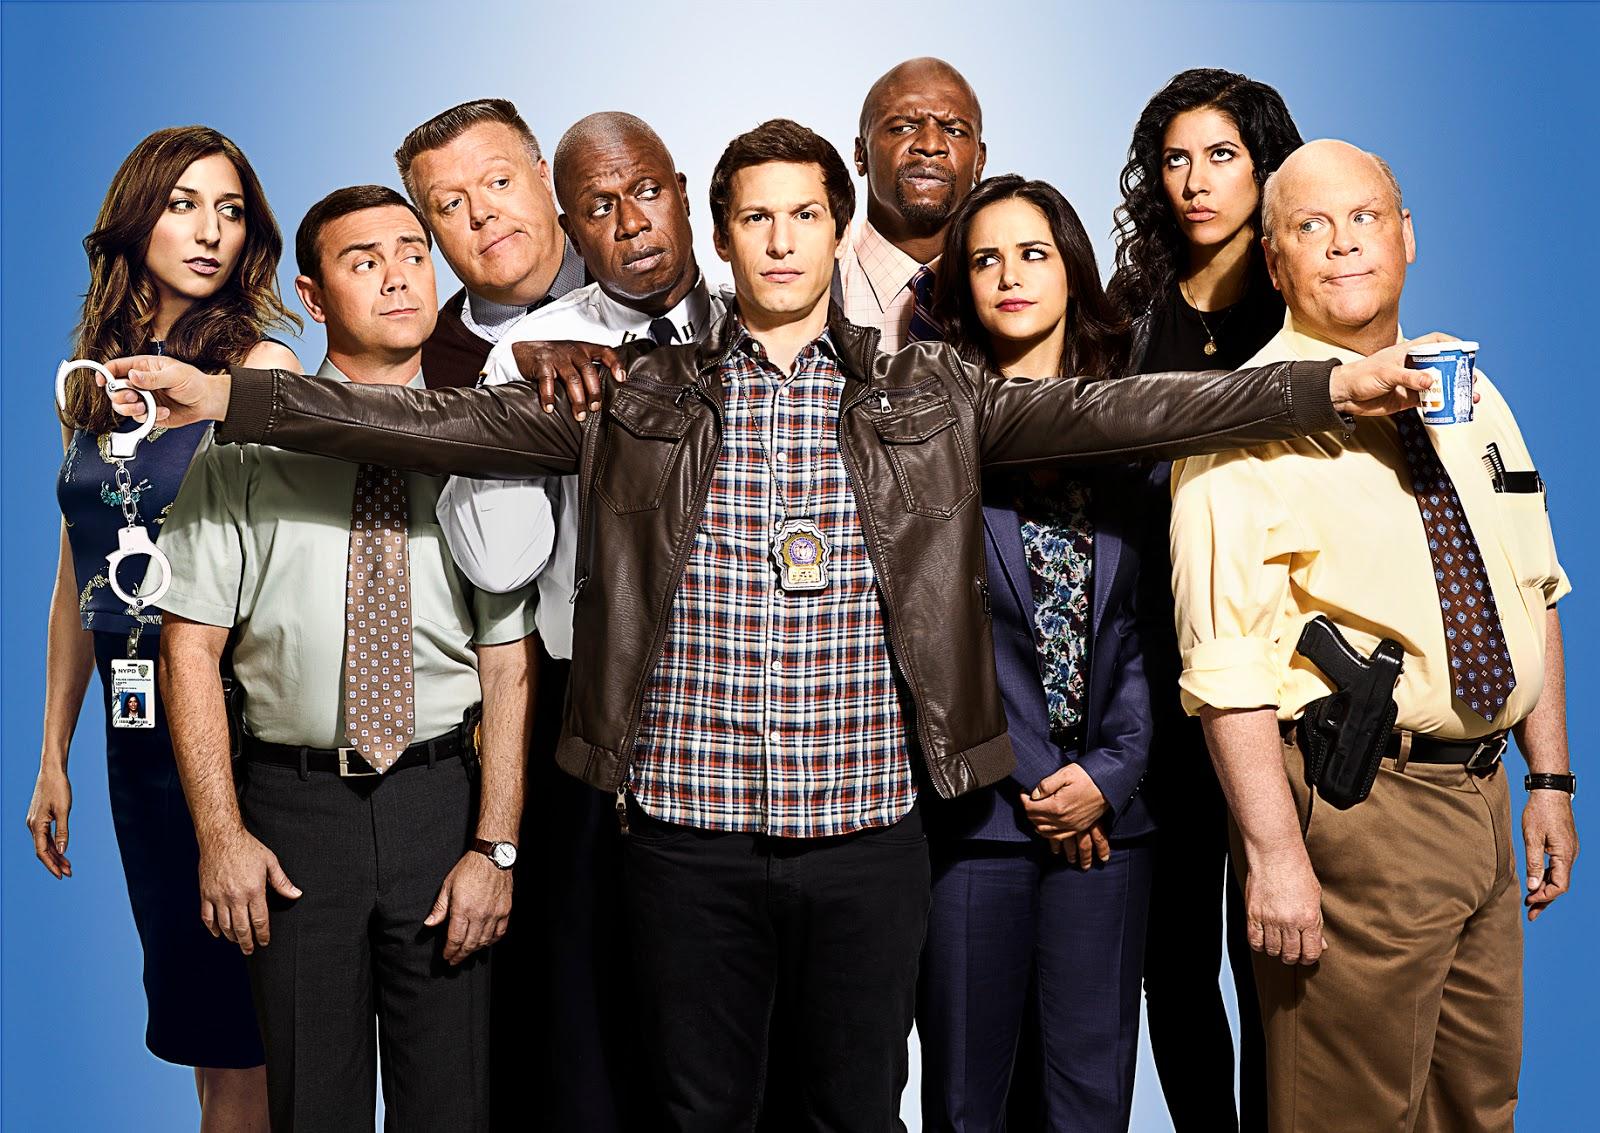 Brooklyn Nine-Nine & The Last Man on Earth - Renewed by FOX